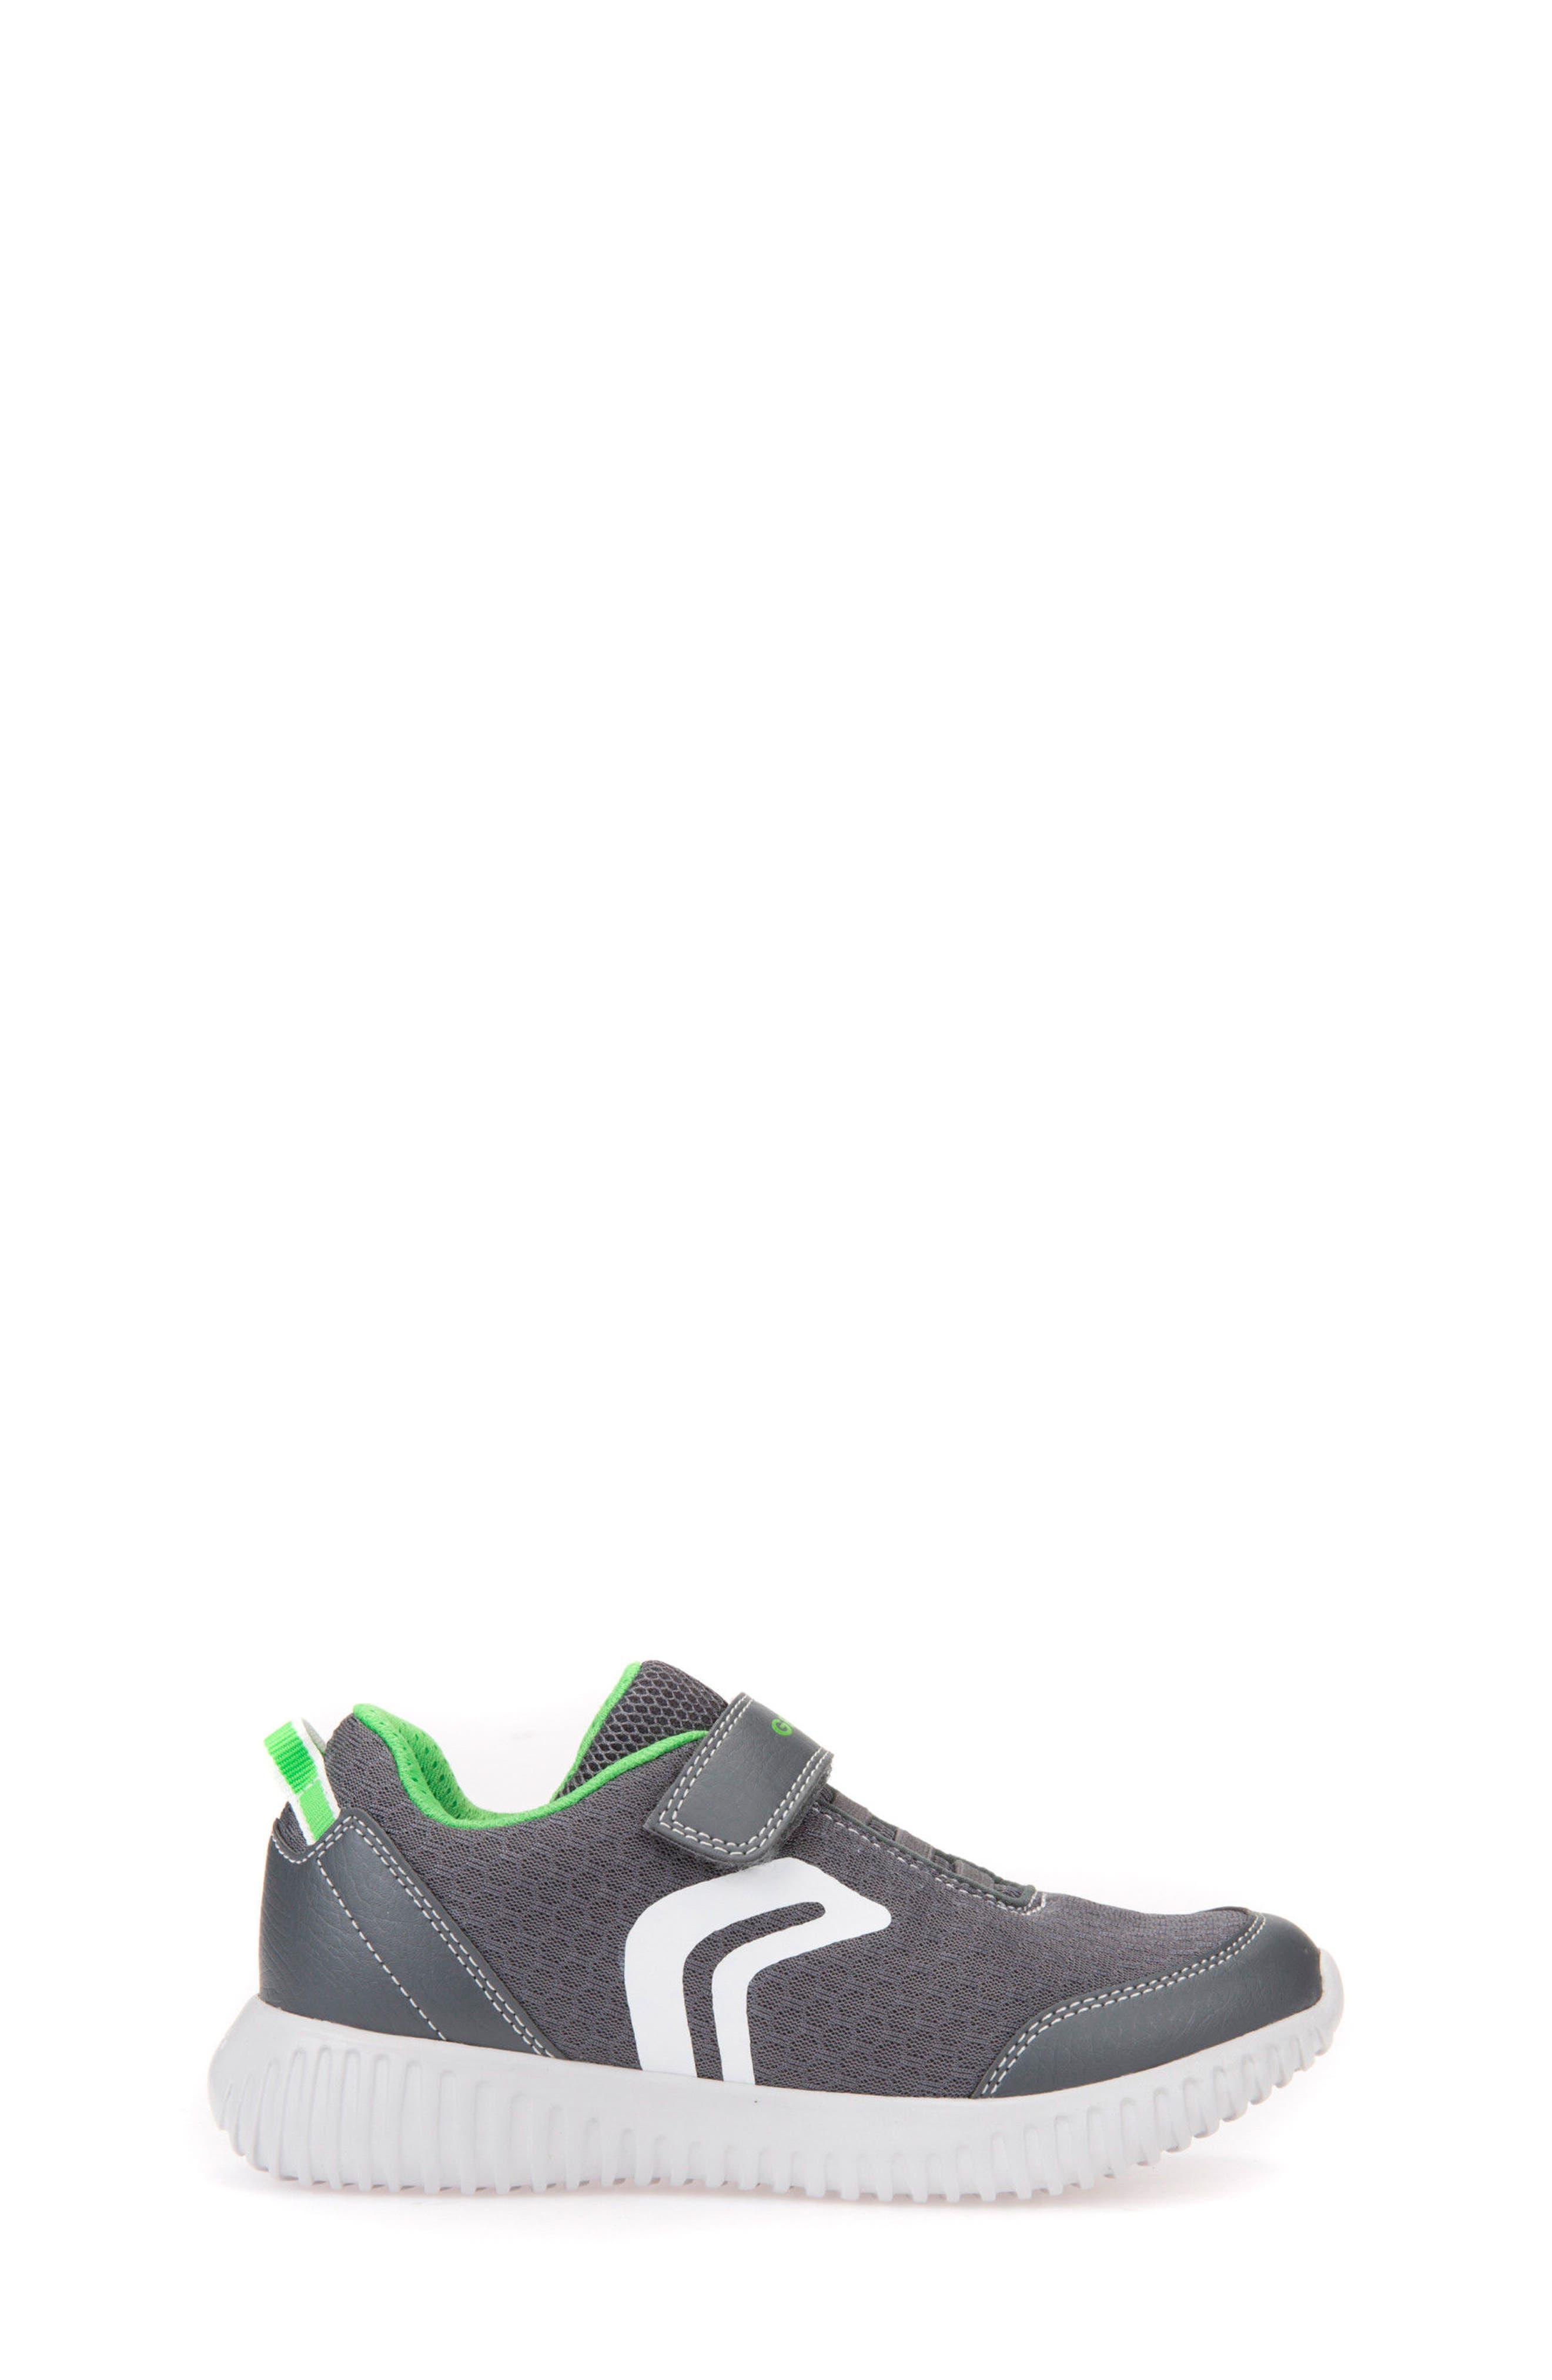 Alternate Image 3  - Geox Waviness Sneaker (Toddler, Little Kid & Big Kid)